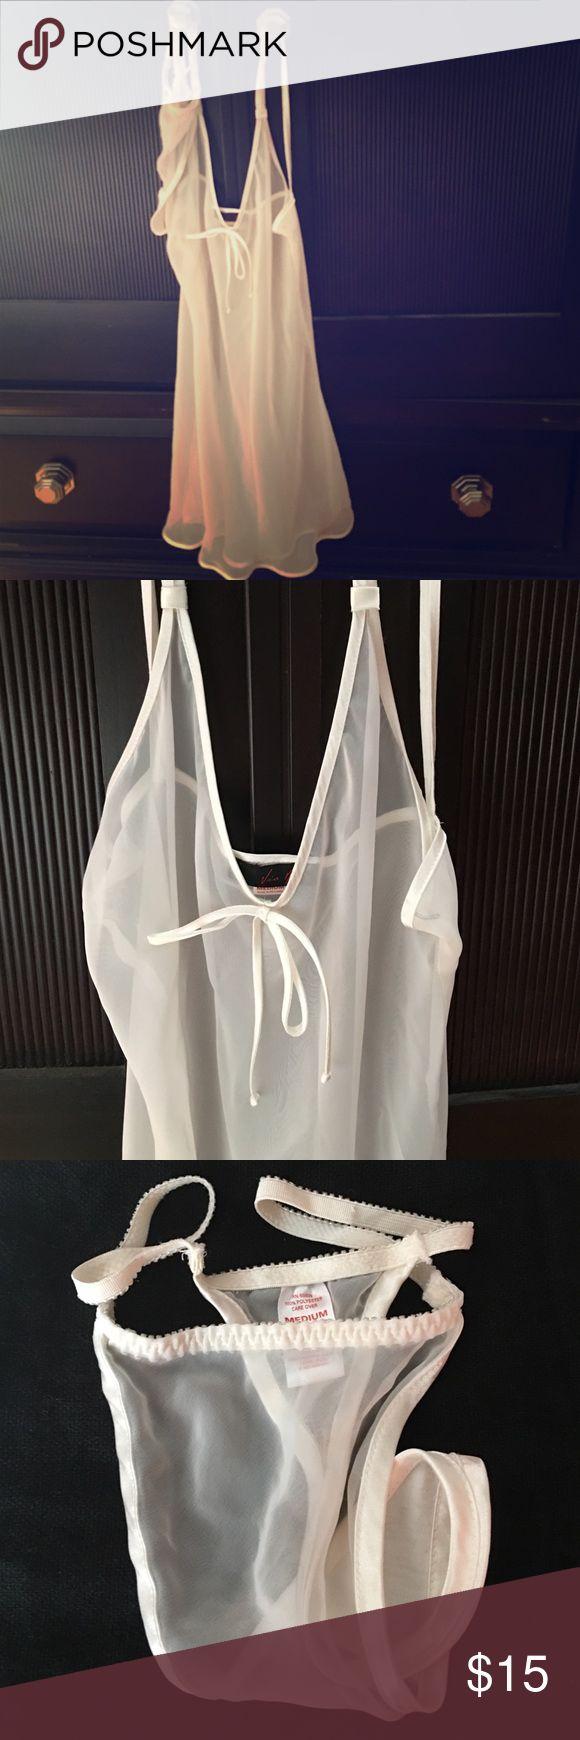 Elegant sexy lingerie set. Bundle only. By Via Nicci. 100% polyester. NWOT. Size Med but runs big. Fits a size LG. Via Nicci Intimates & Sleepwear Chemises & Slips